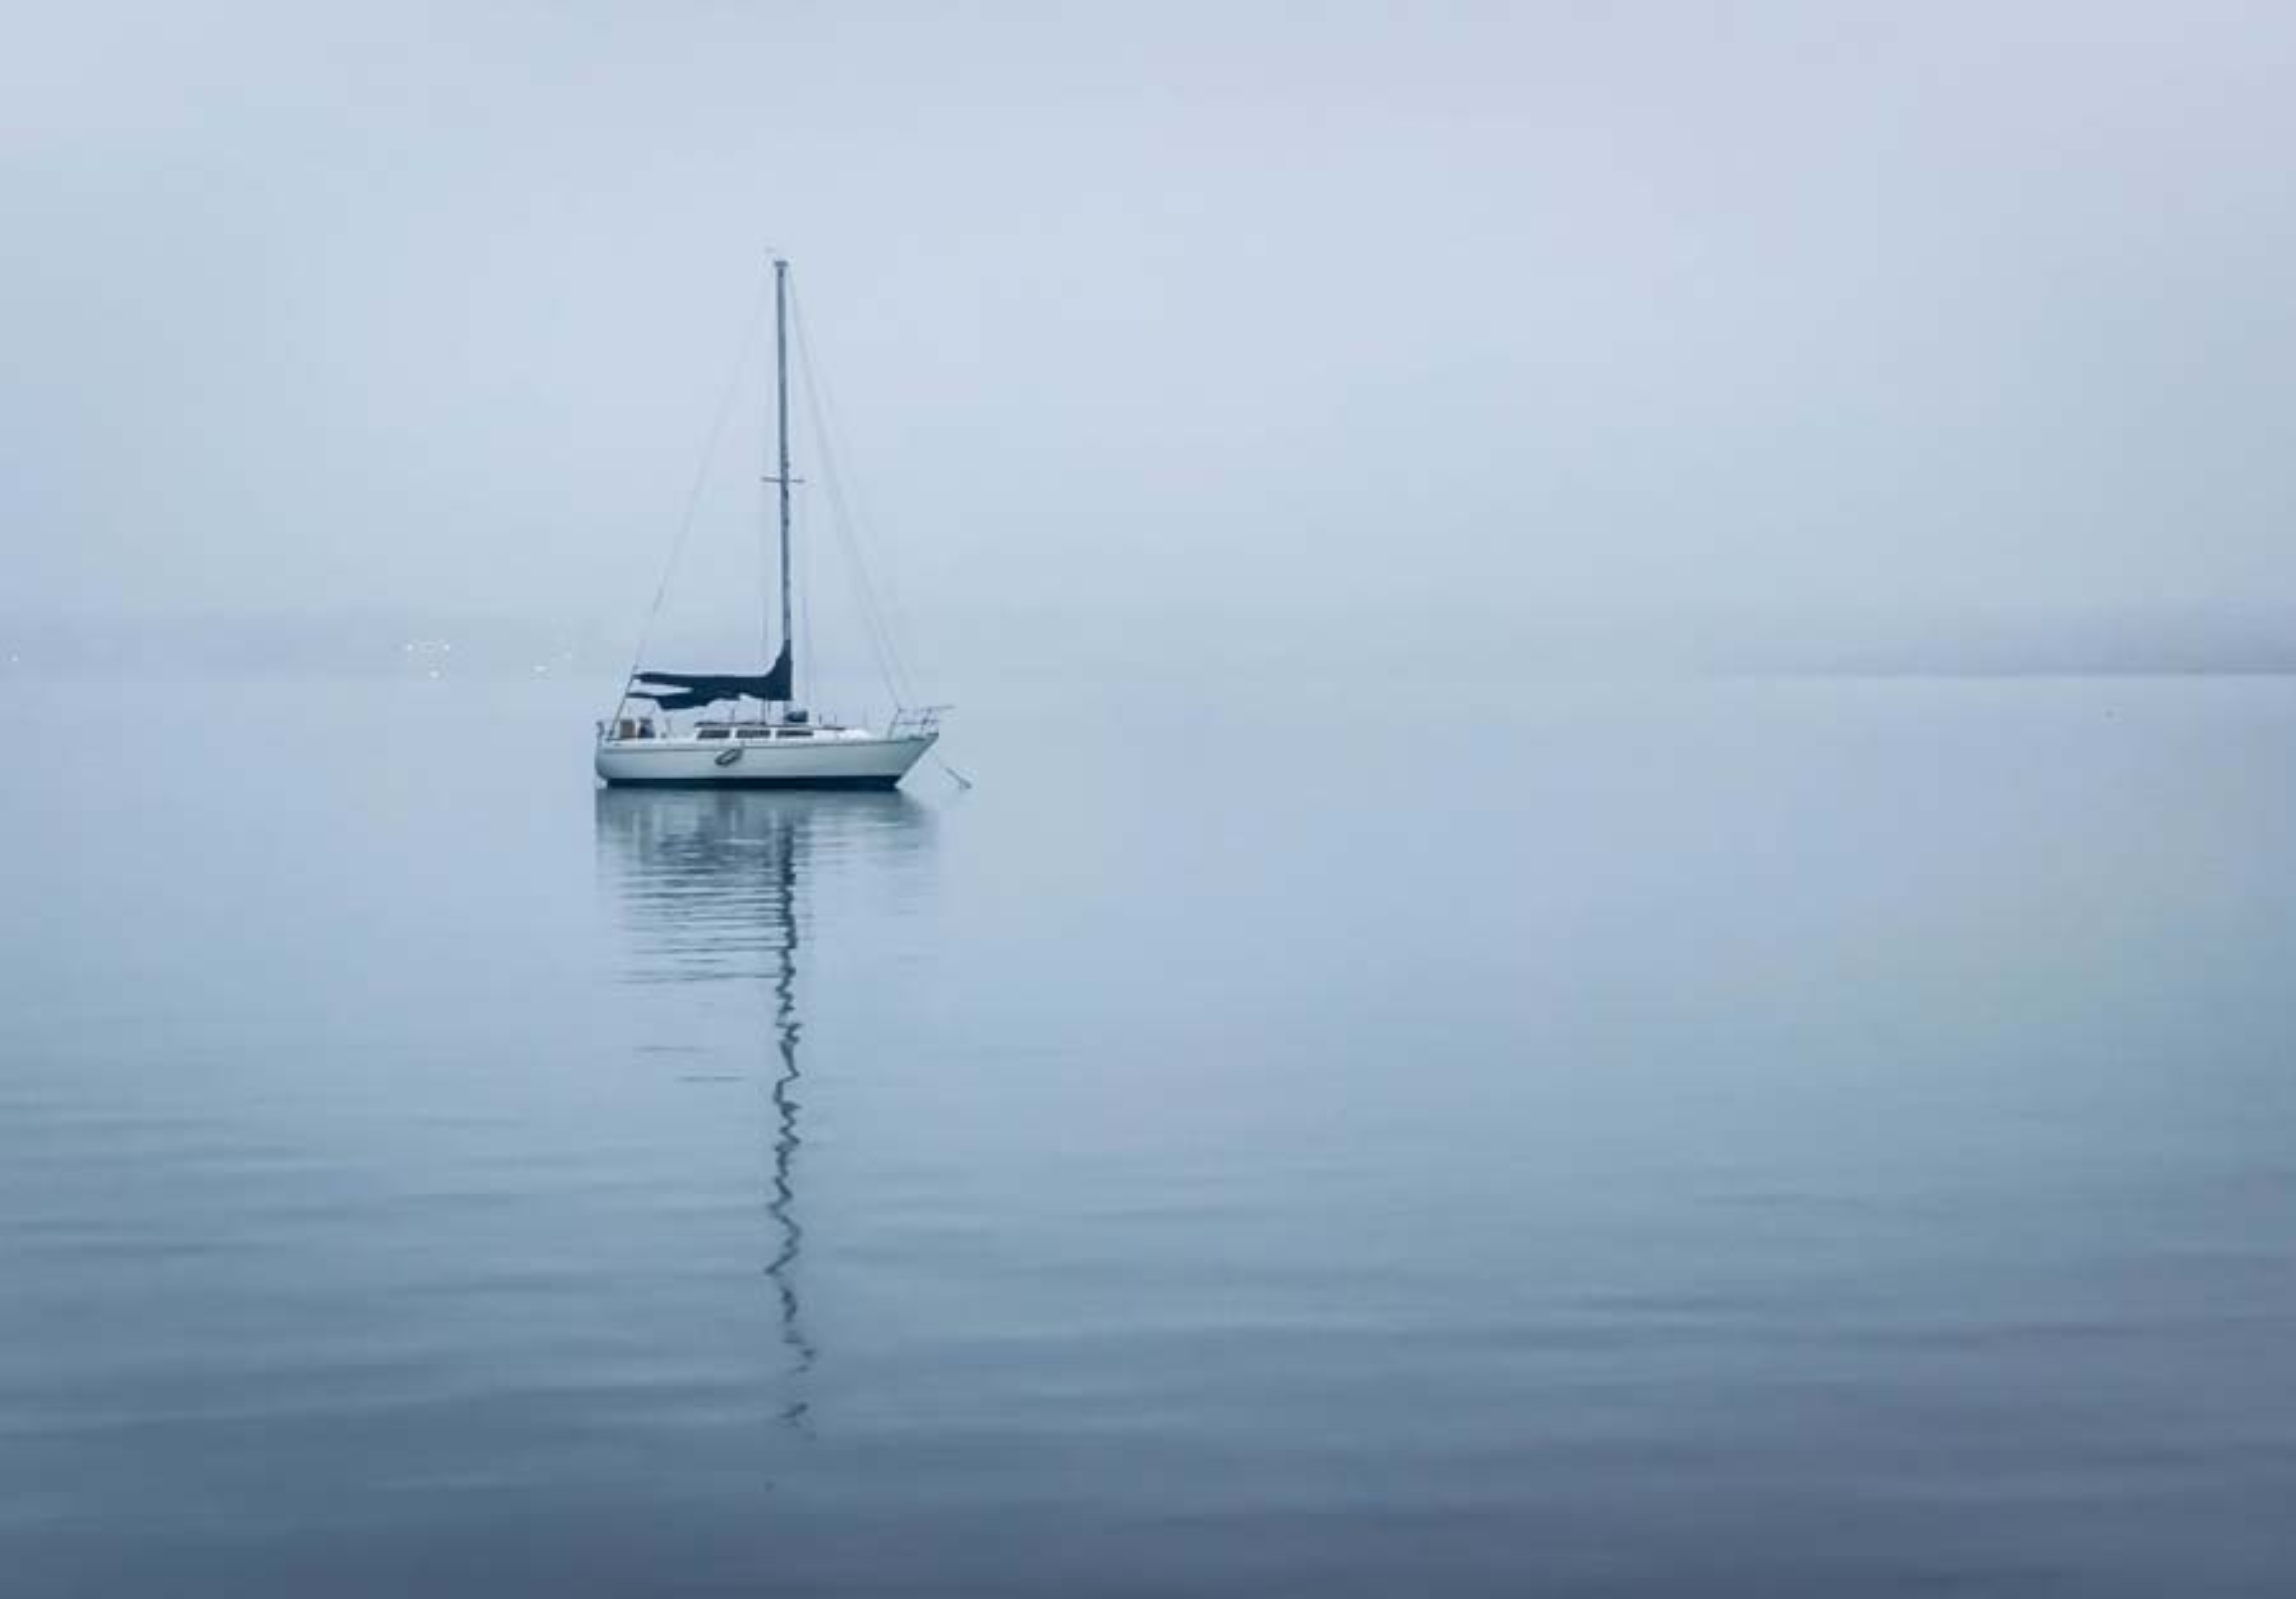 Foggy bay, USA